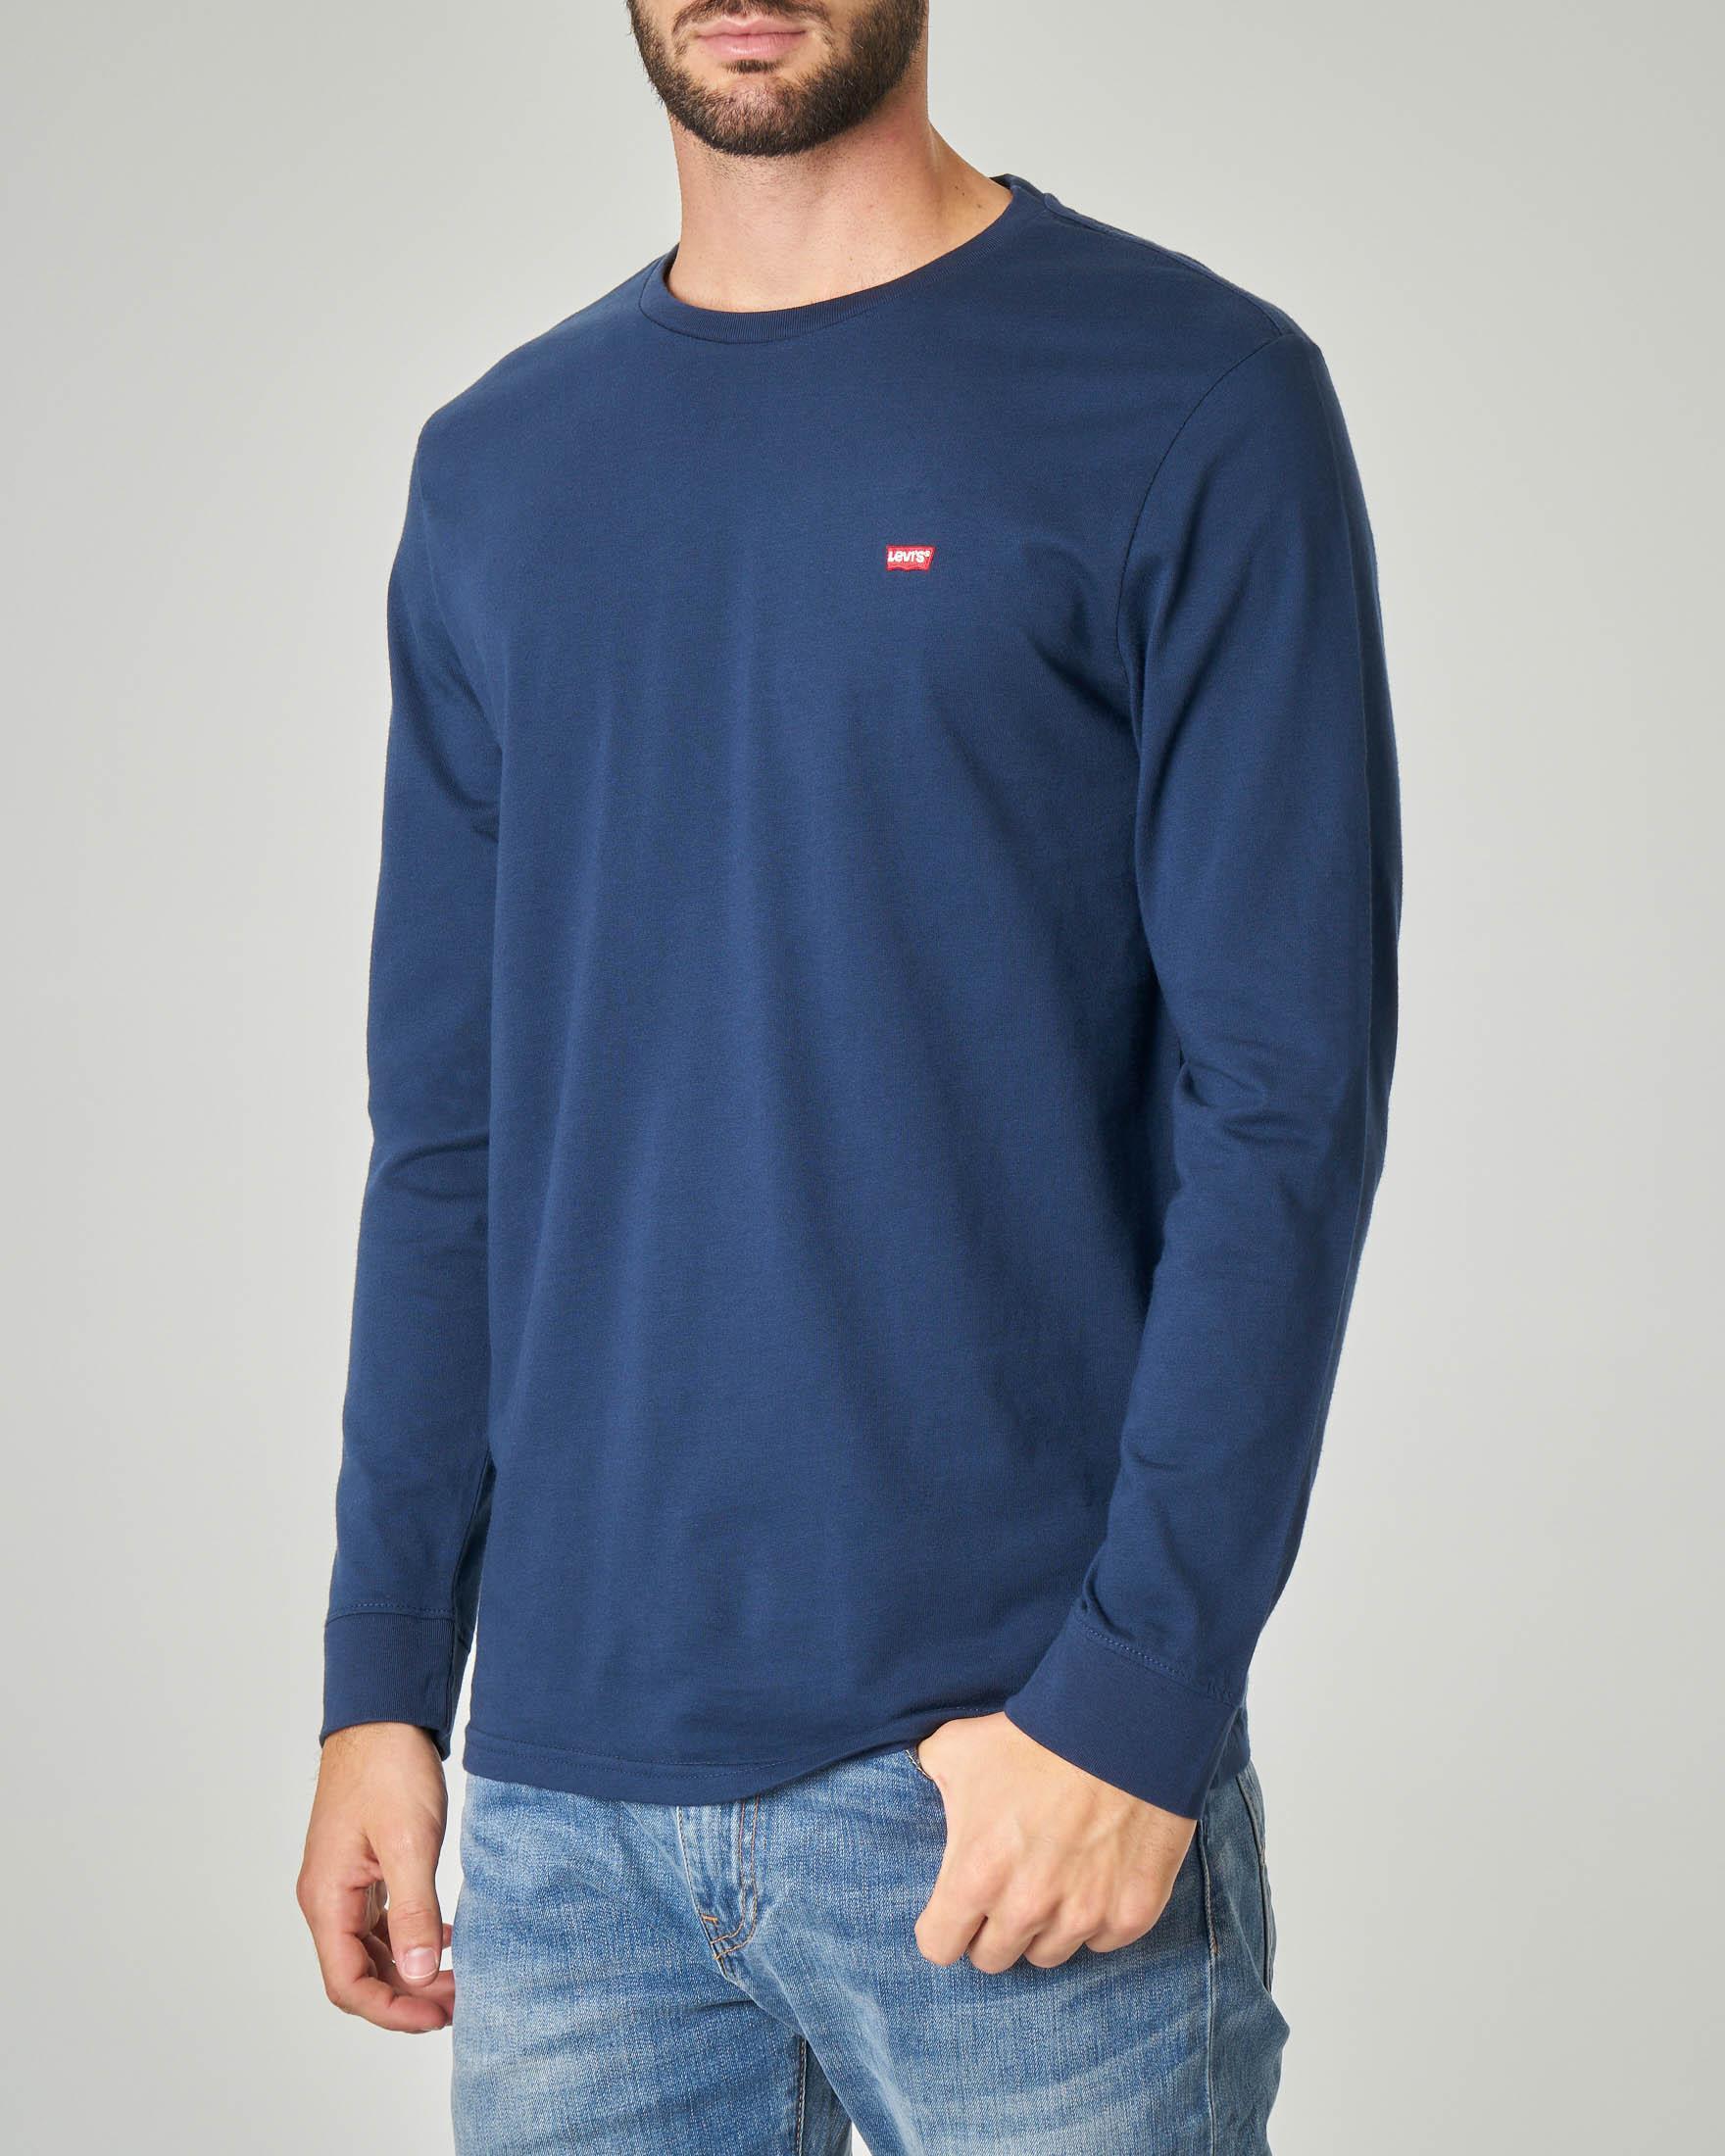 T-shirt blu manica lunga con logo batwing piccolo